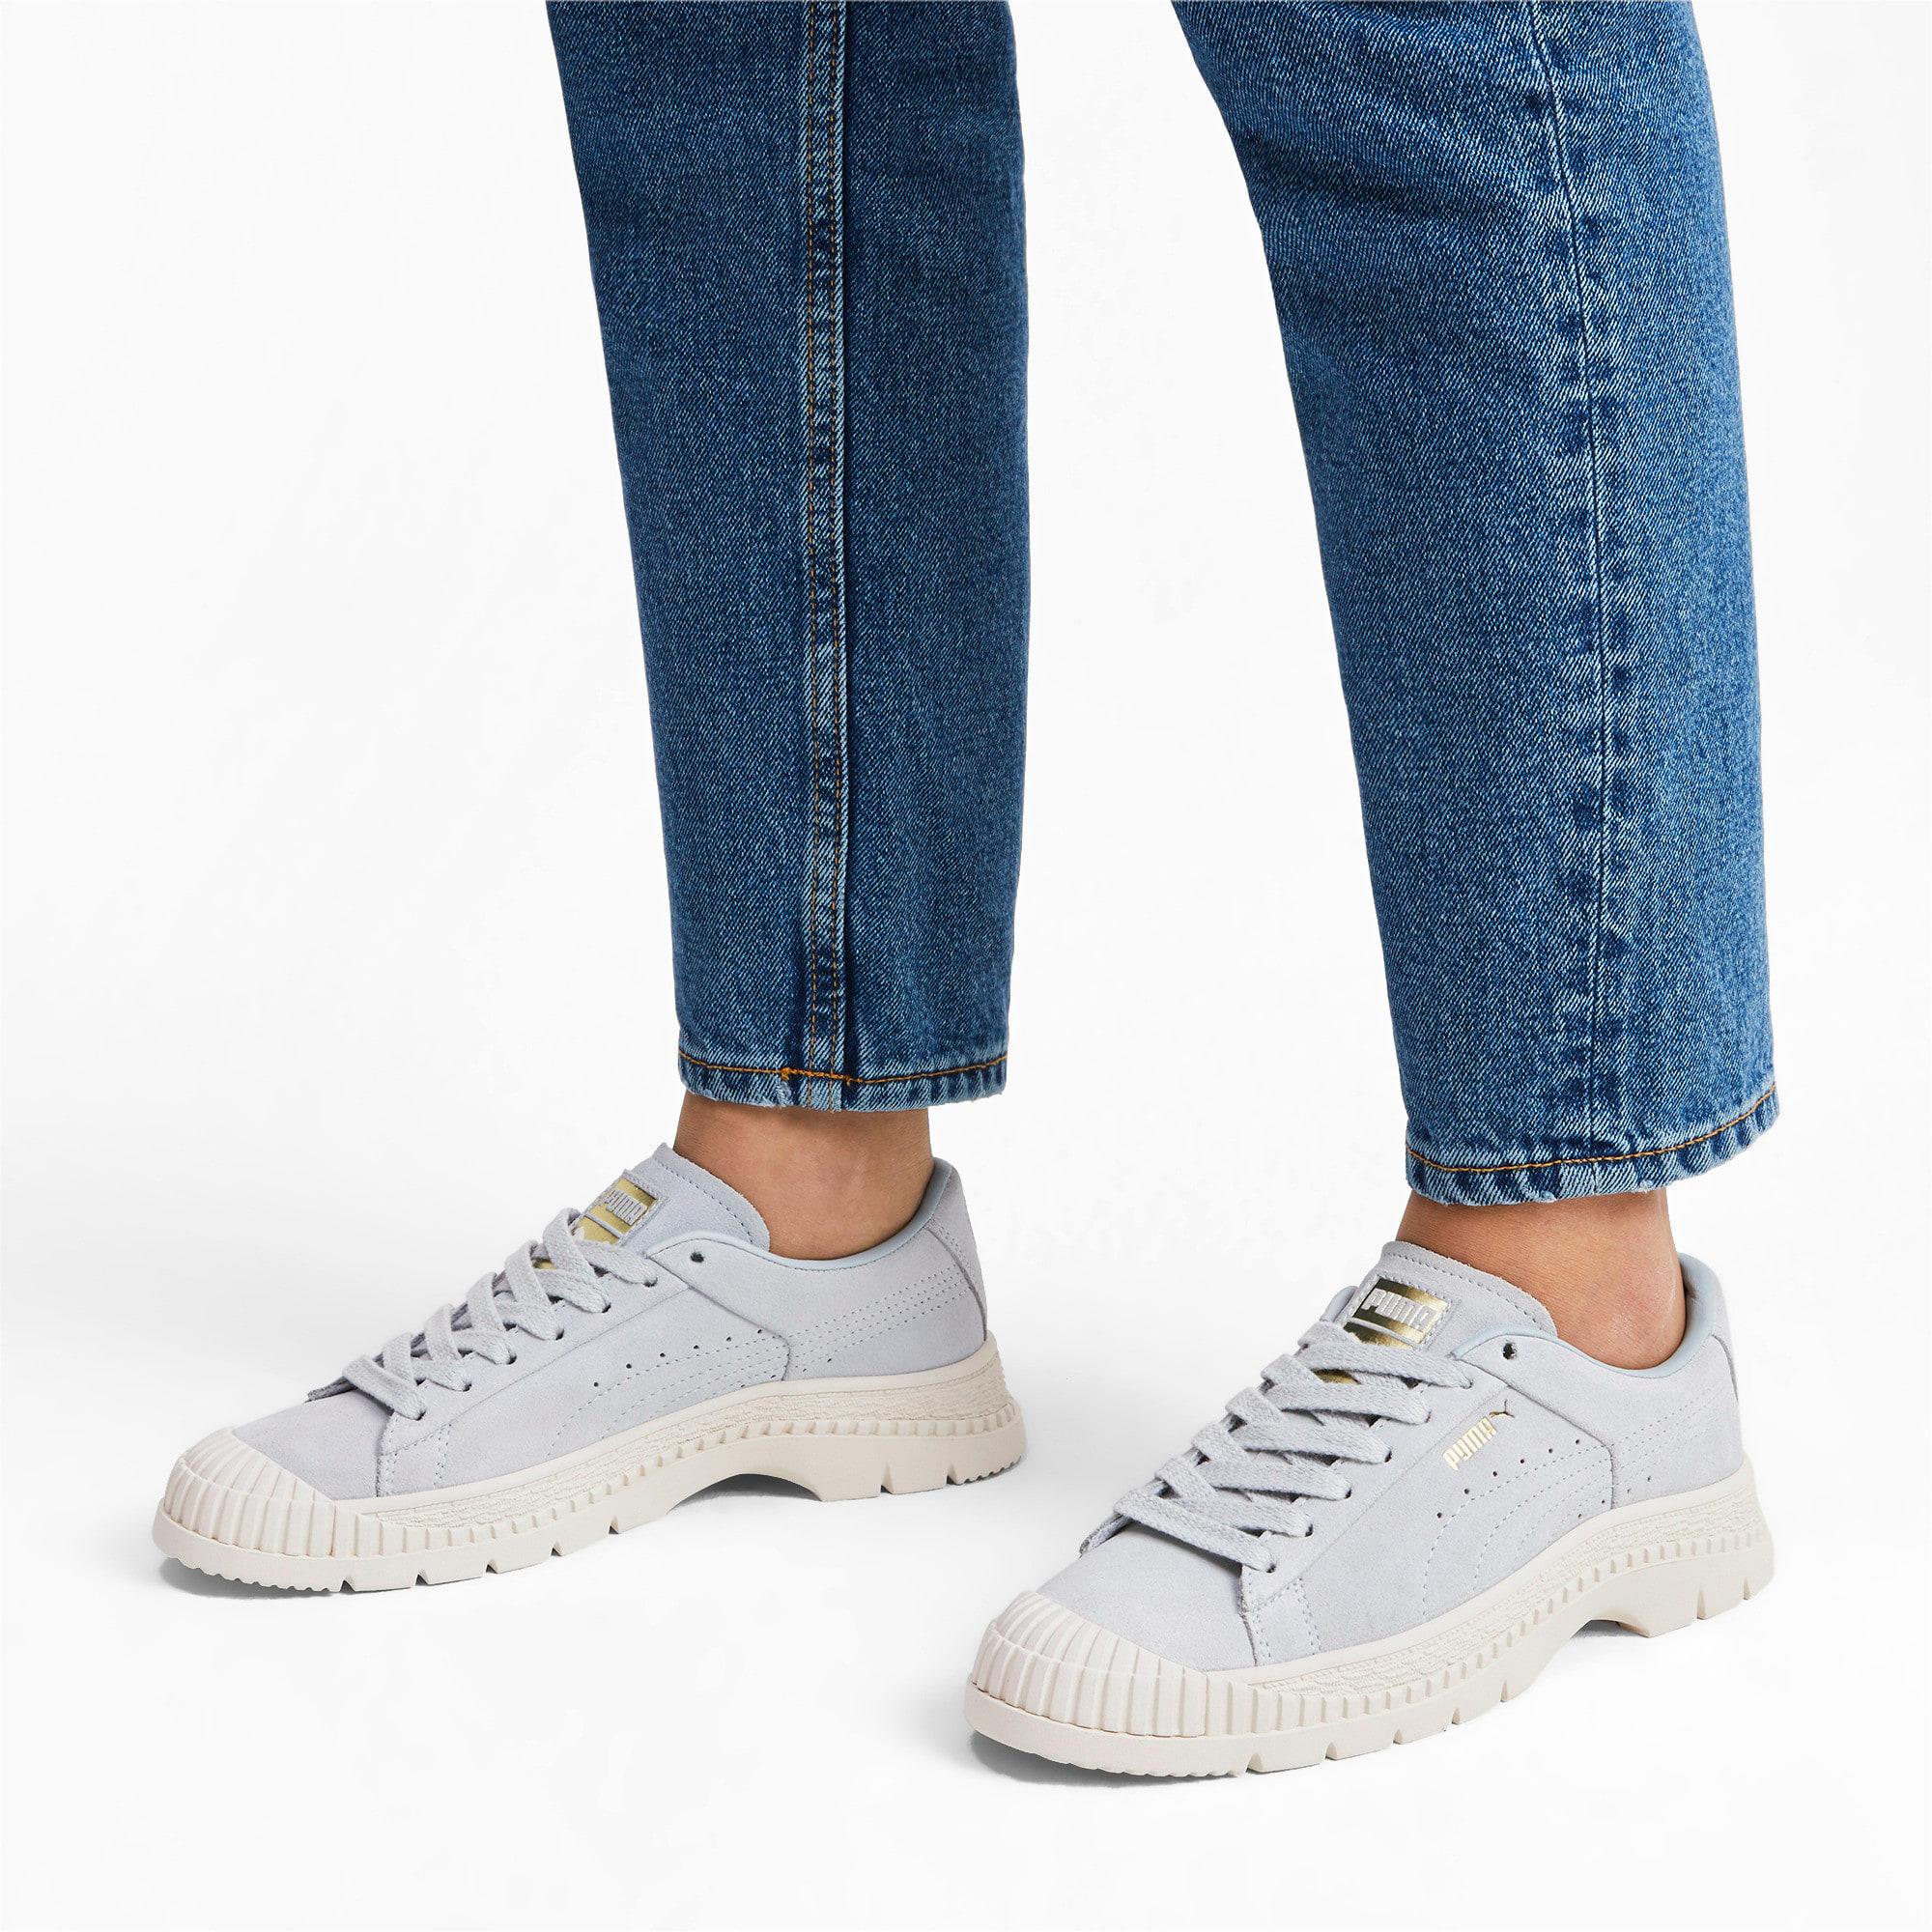 Thumbnail 2 of Utility Suede Women's Sneakers, Heather, medium